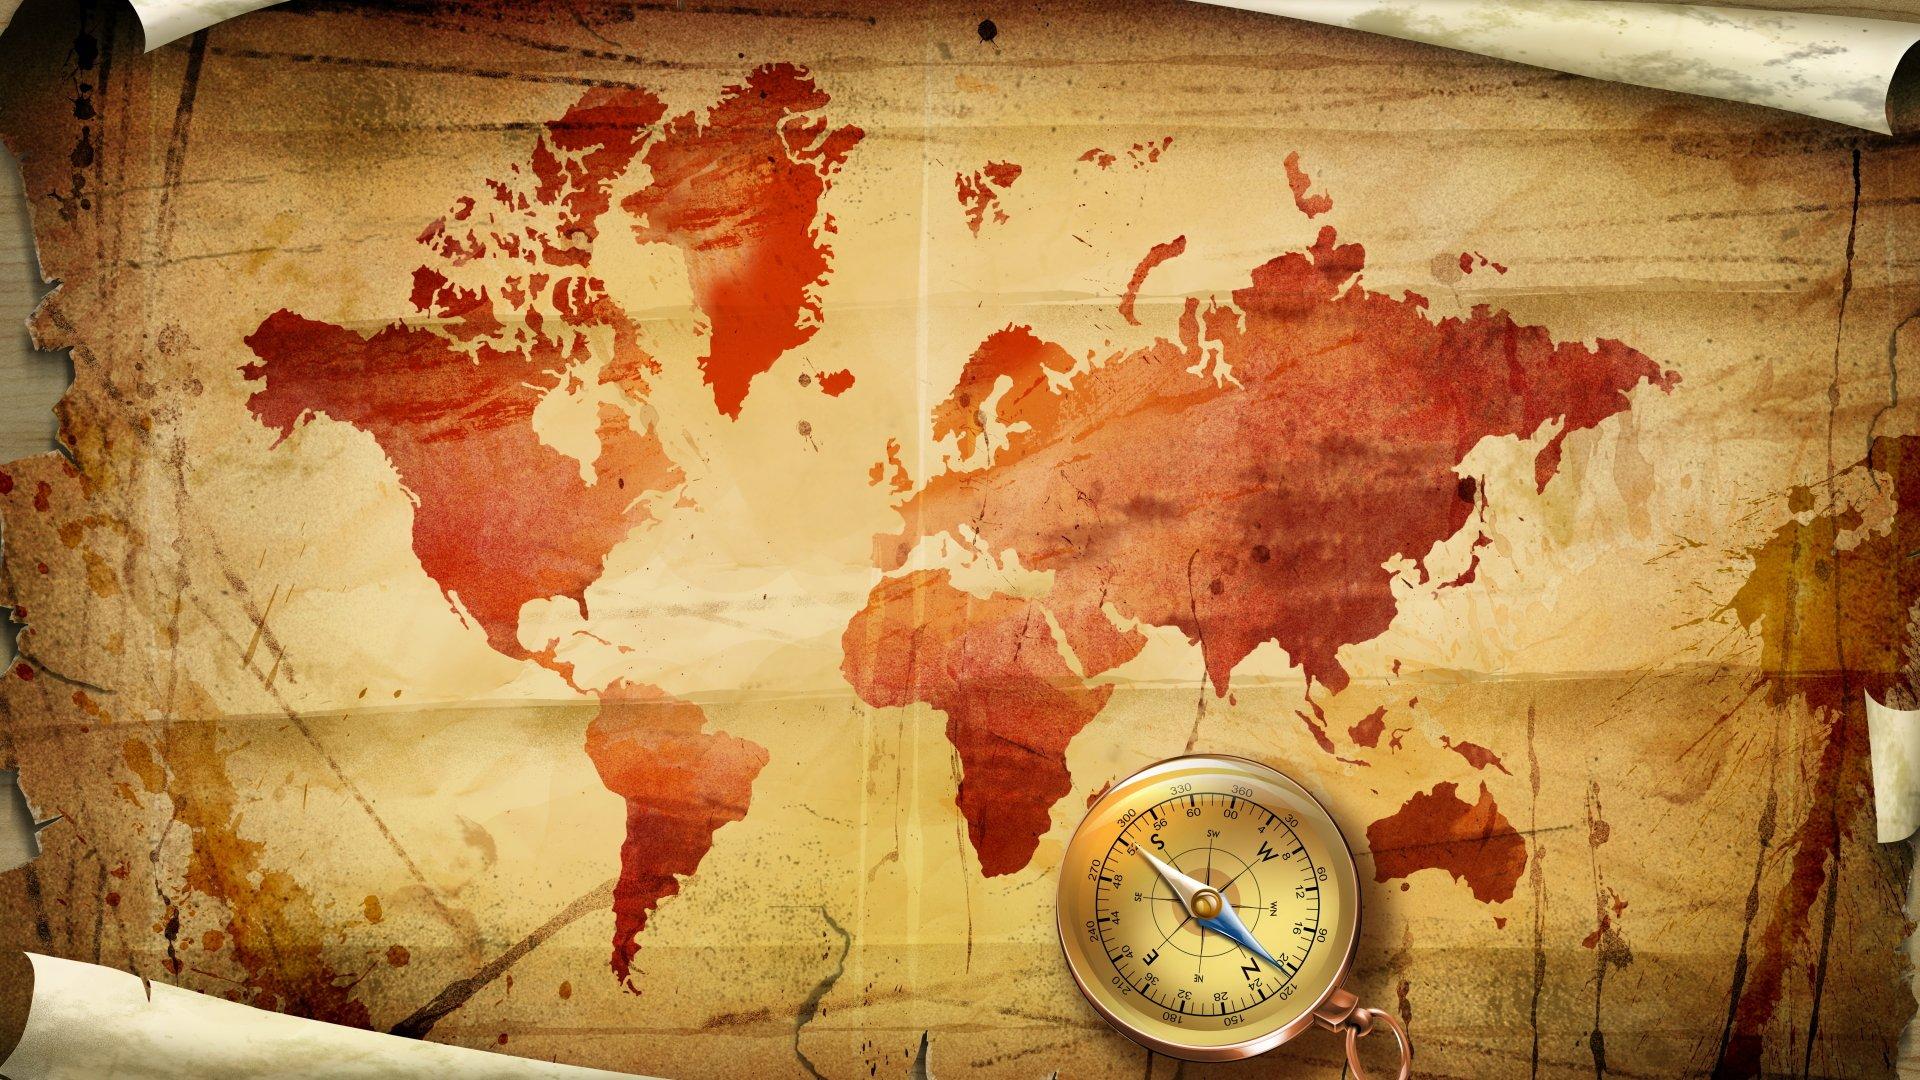 Carte du monde 5k retina ultra hd fond d 39 cran and arri re for Fond ecran monde